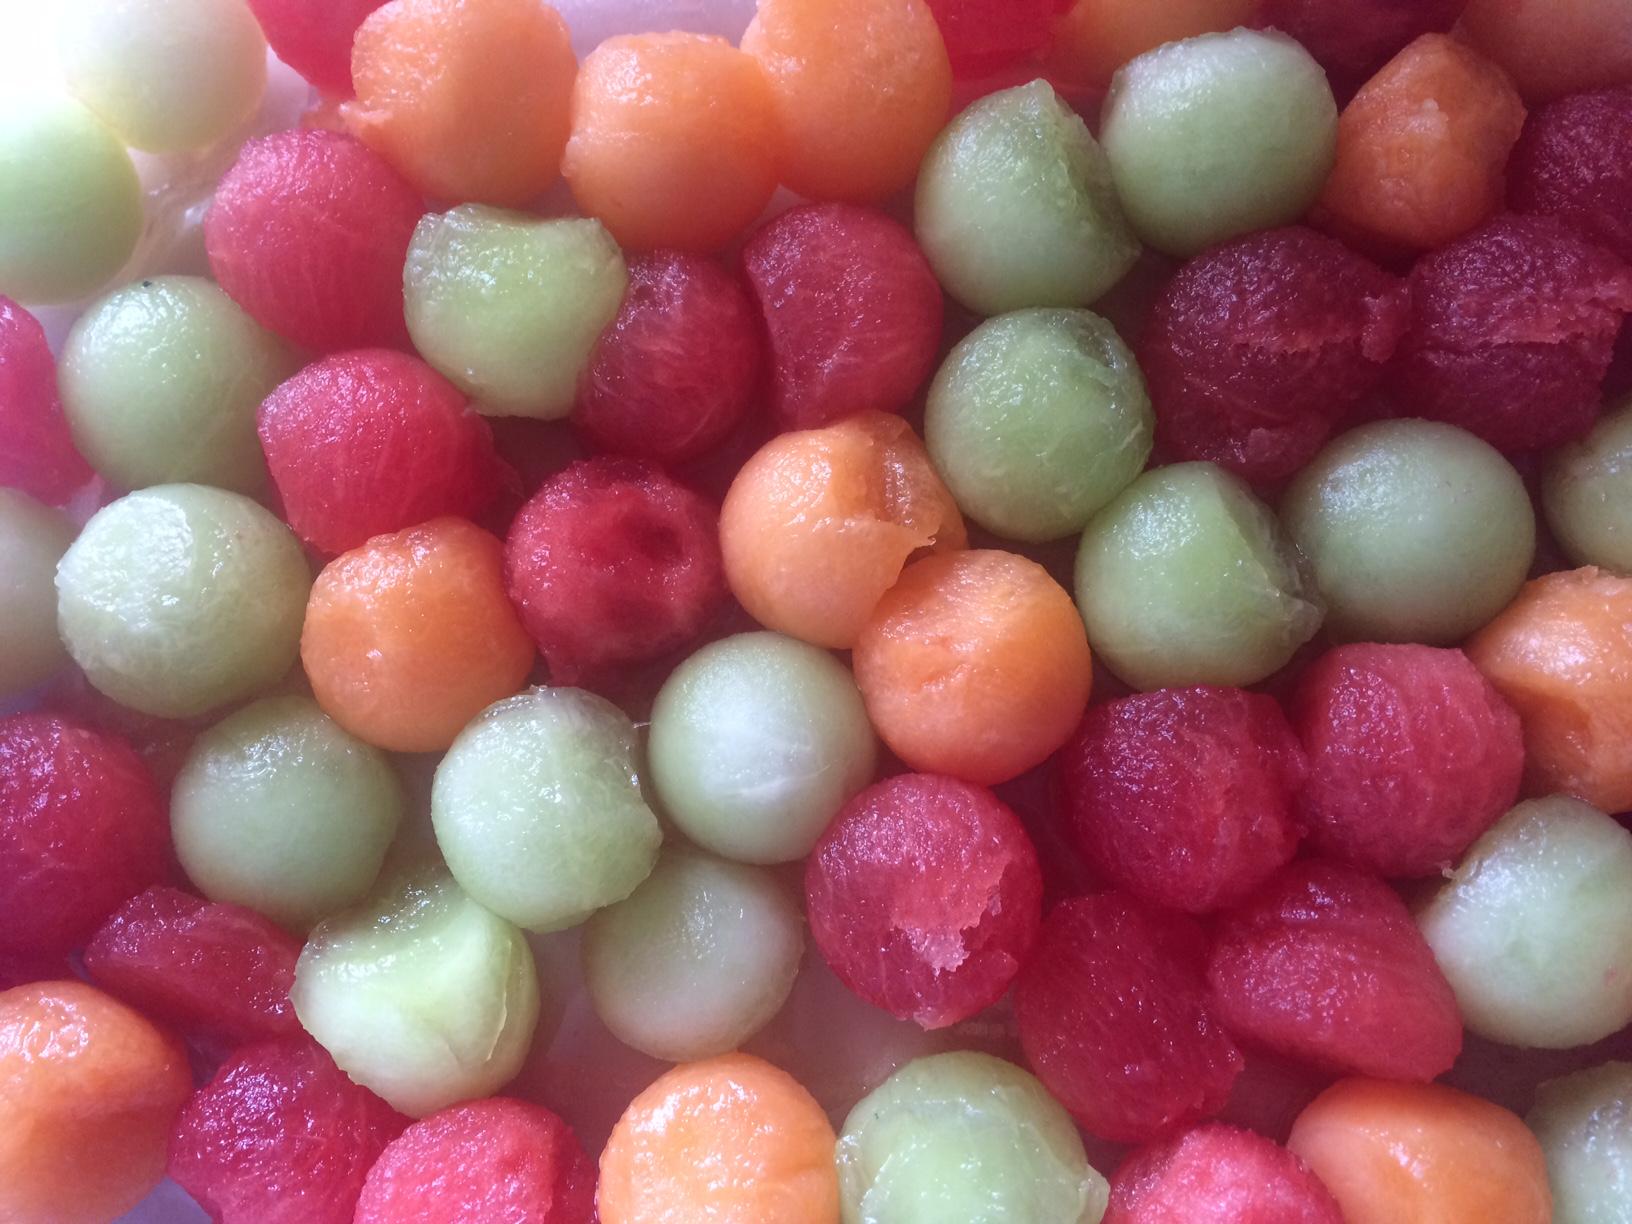 Image of melon balls